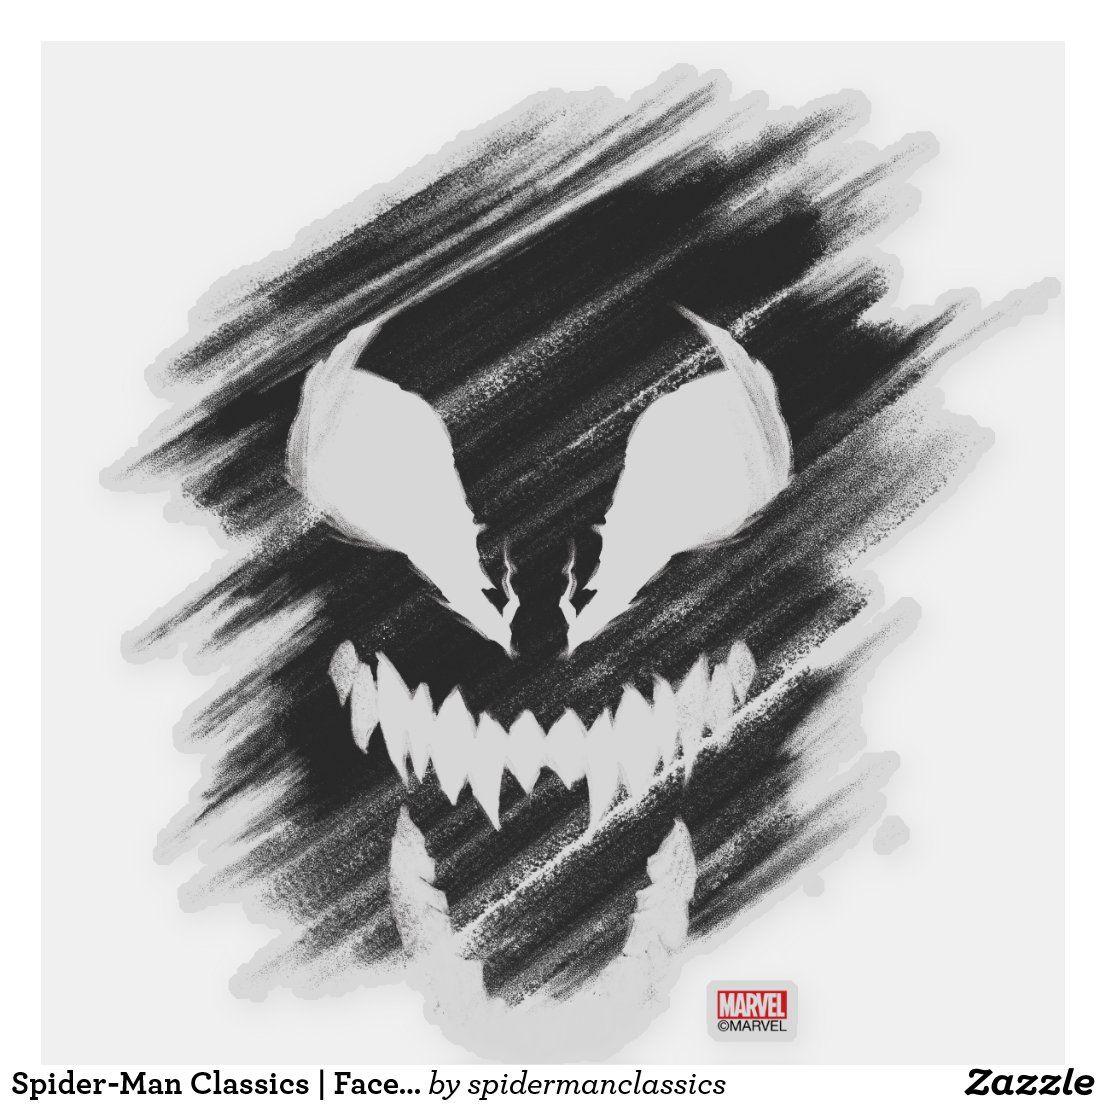 Spider Man Classics Face Of Venom Sticker Zazzle Com In 2021 Graphic Eyes Disney Sticker Spiderman [ 1106 x 1106 Pixel ]